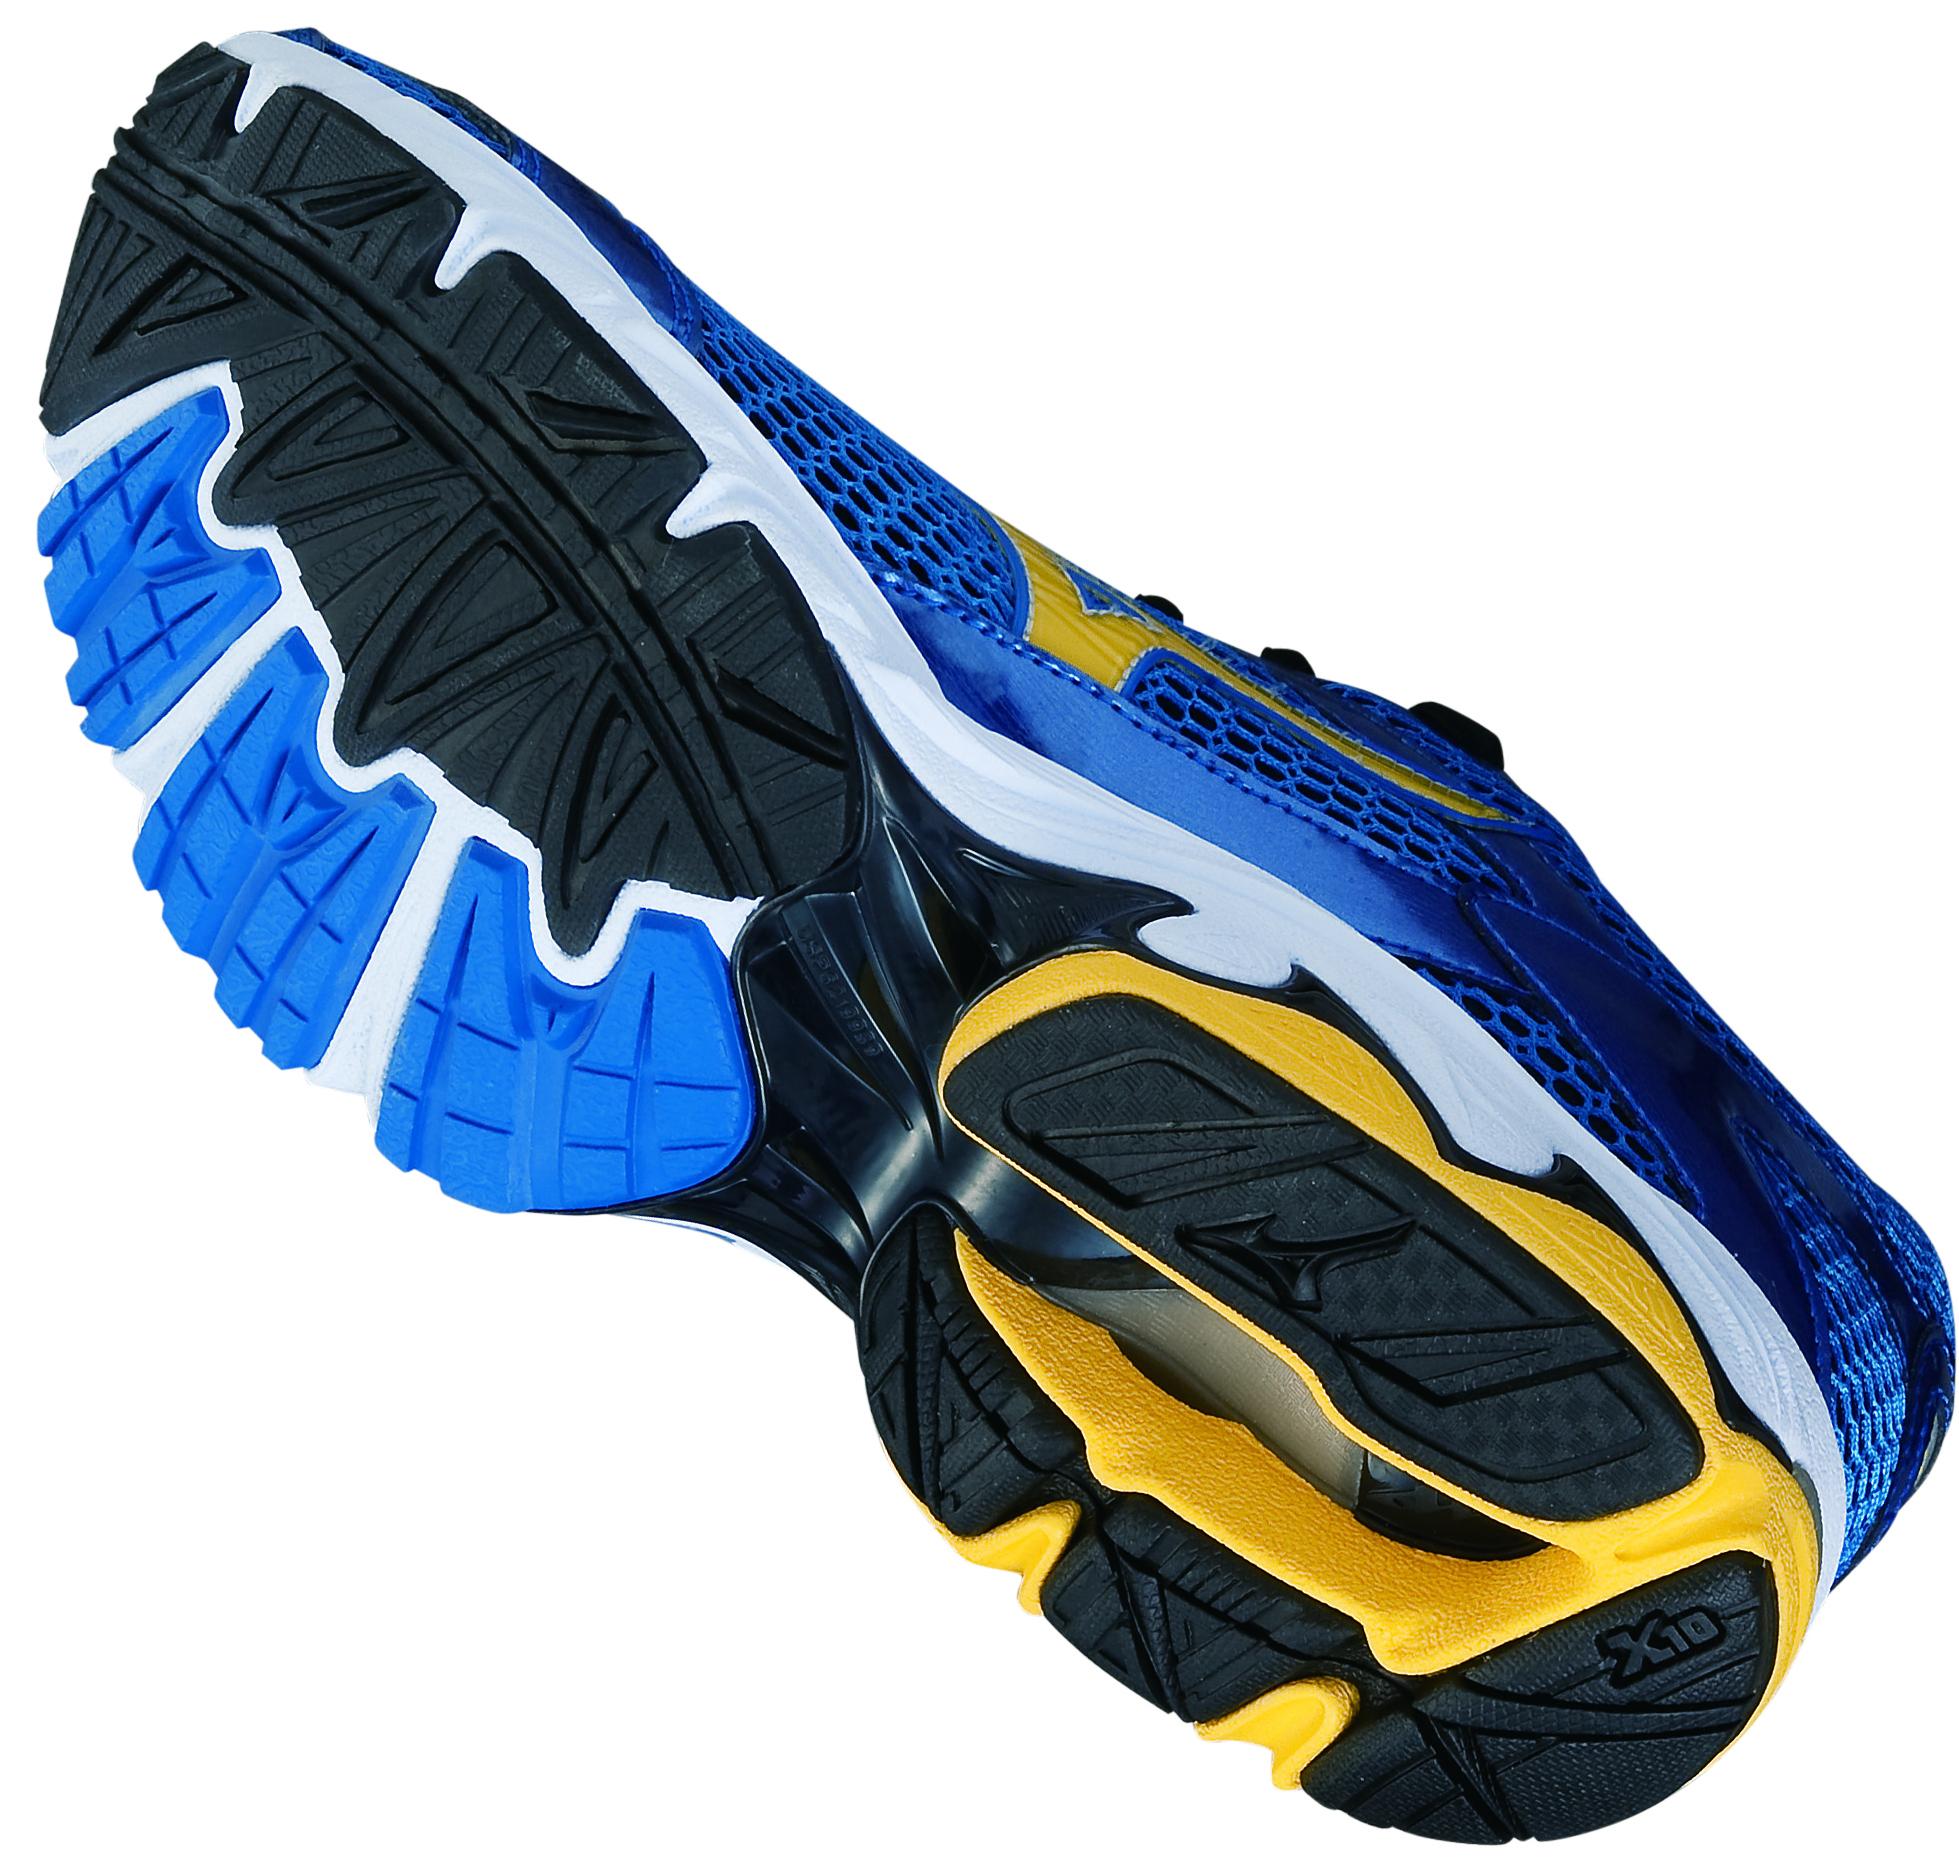 Mizuno Wave NEXUS 7 Кроссовки для бега мужские blue